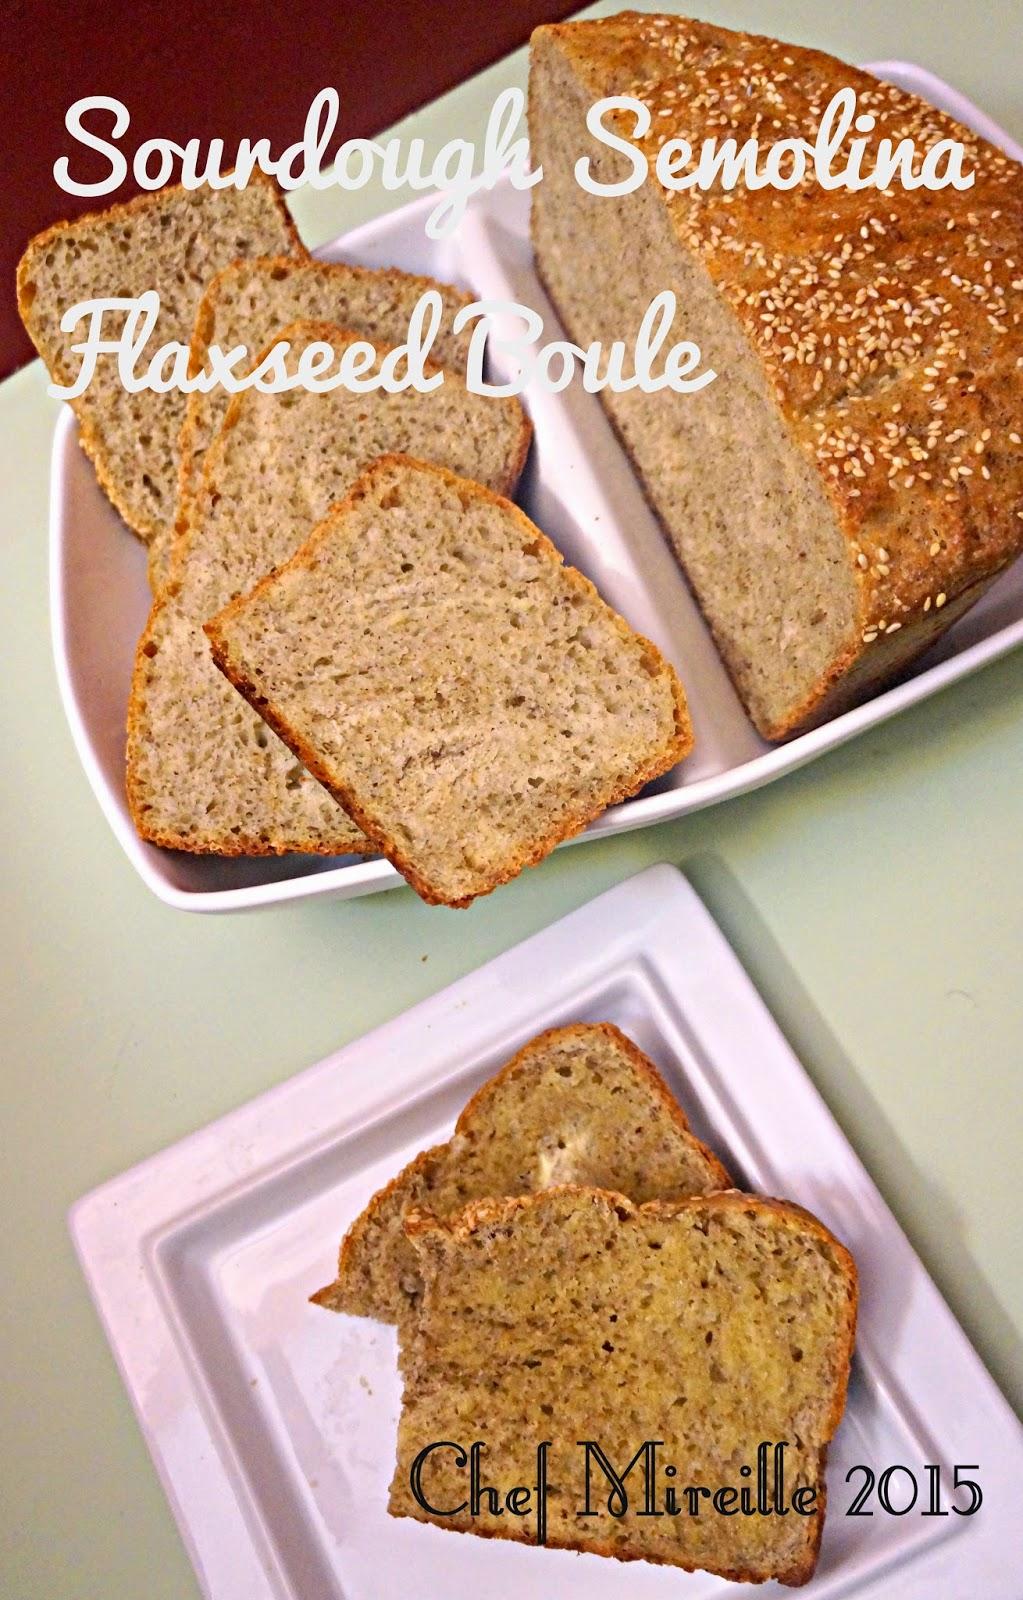 Sourdough Bread, Sourdough Semolina, Flax Seed Boule